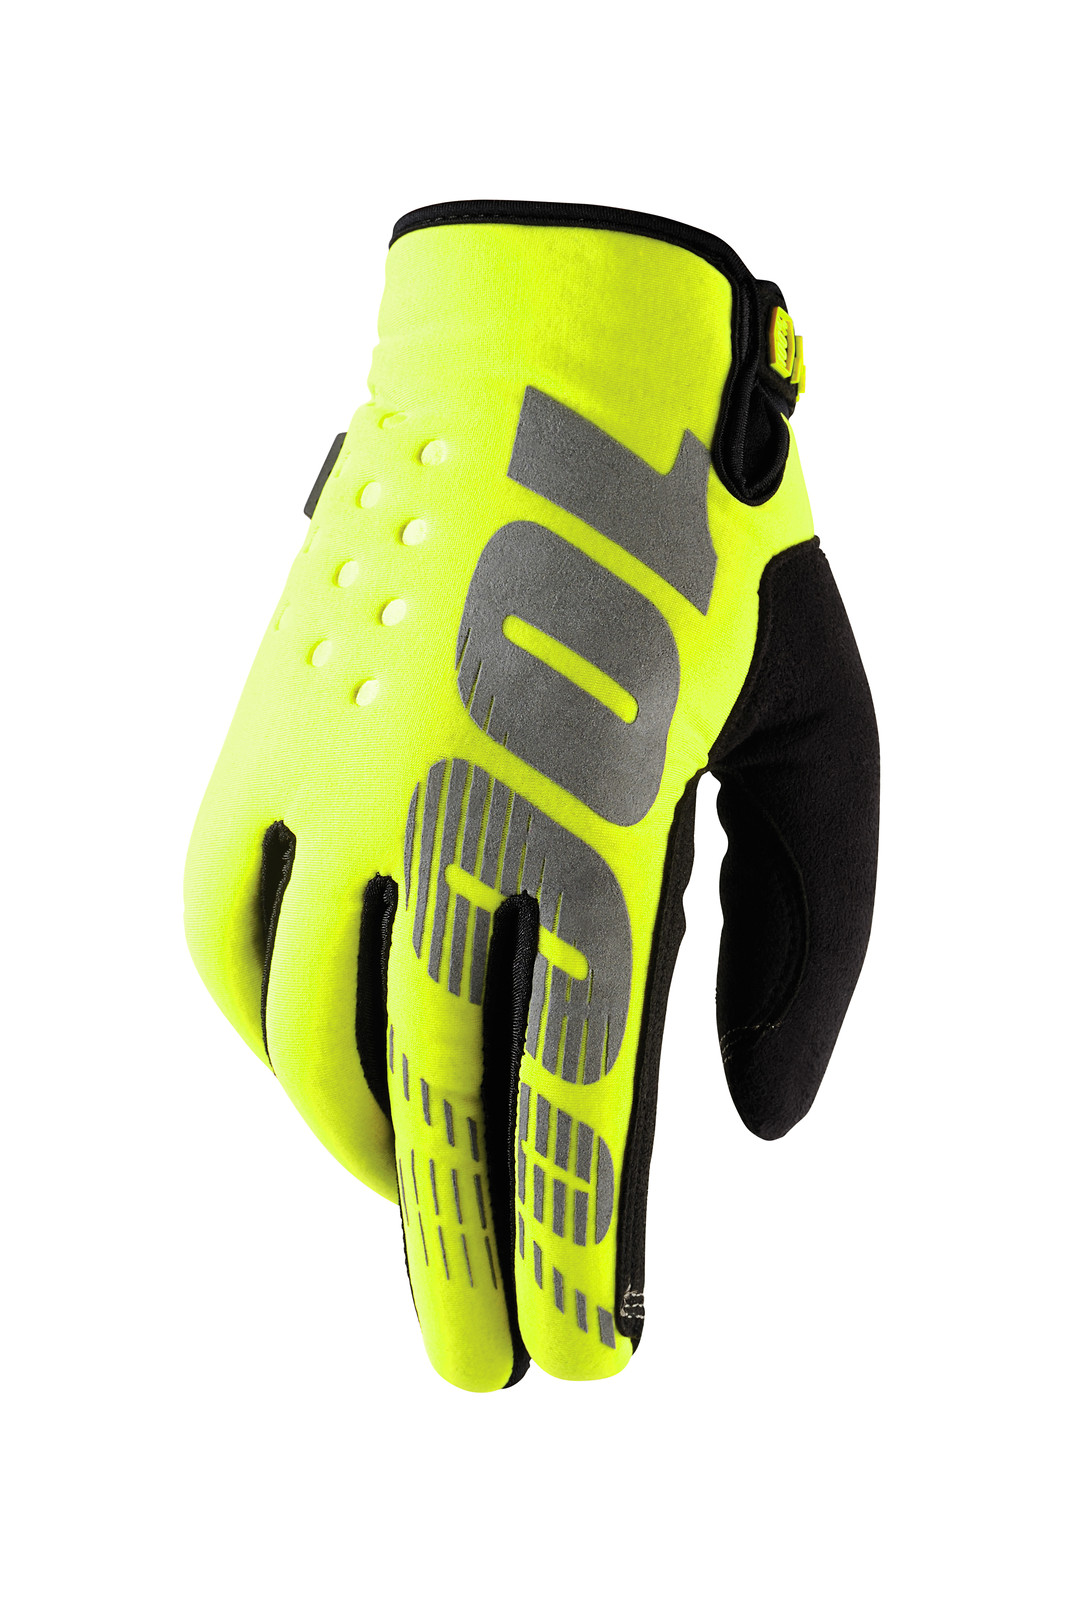 Brisker Glove - Neon Yellow - 100percent - Motocross Pictures - Vital MX